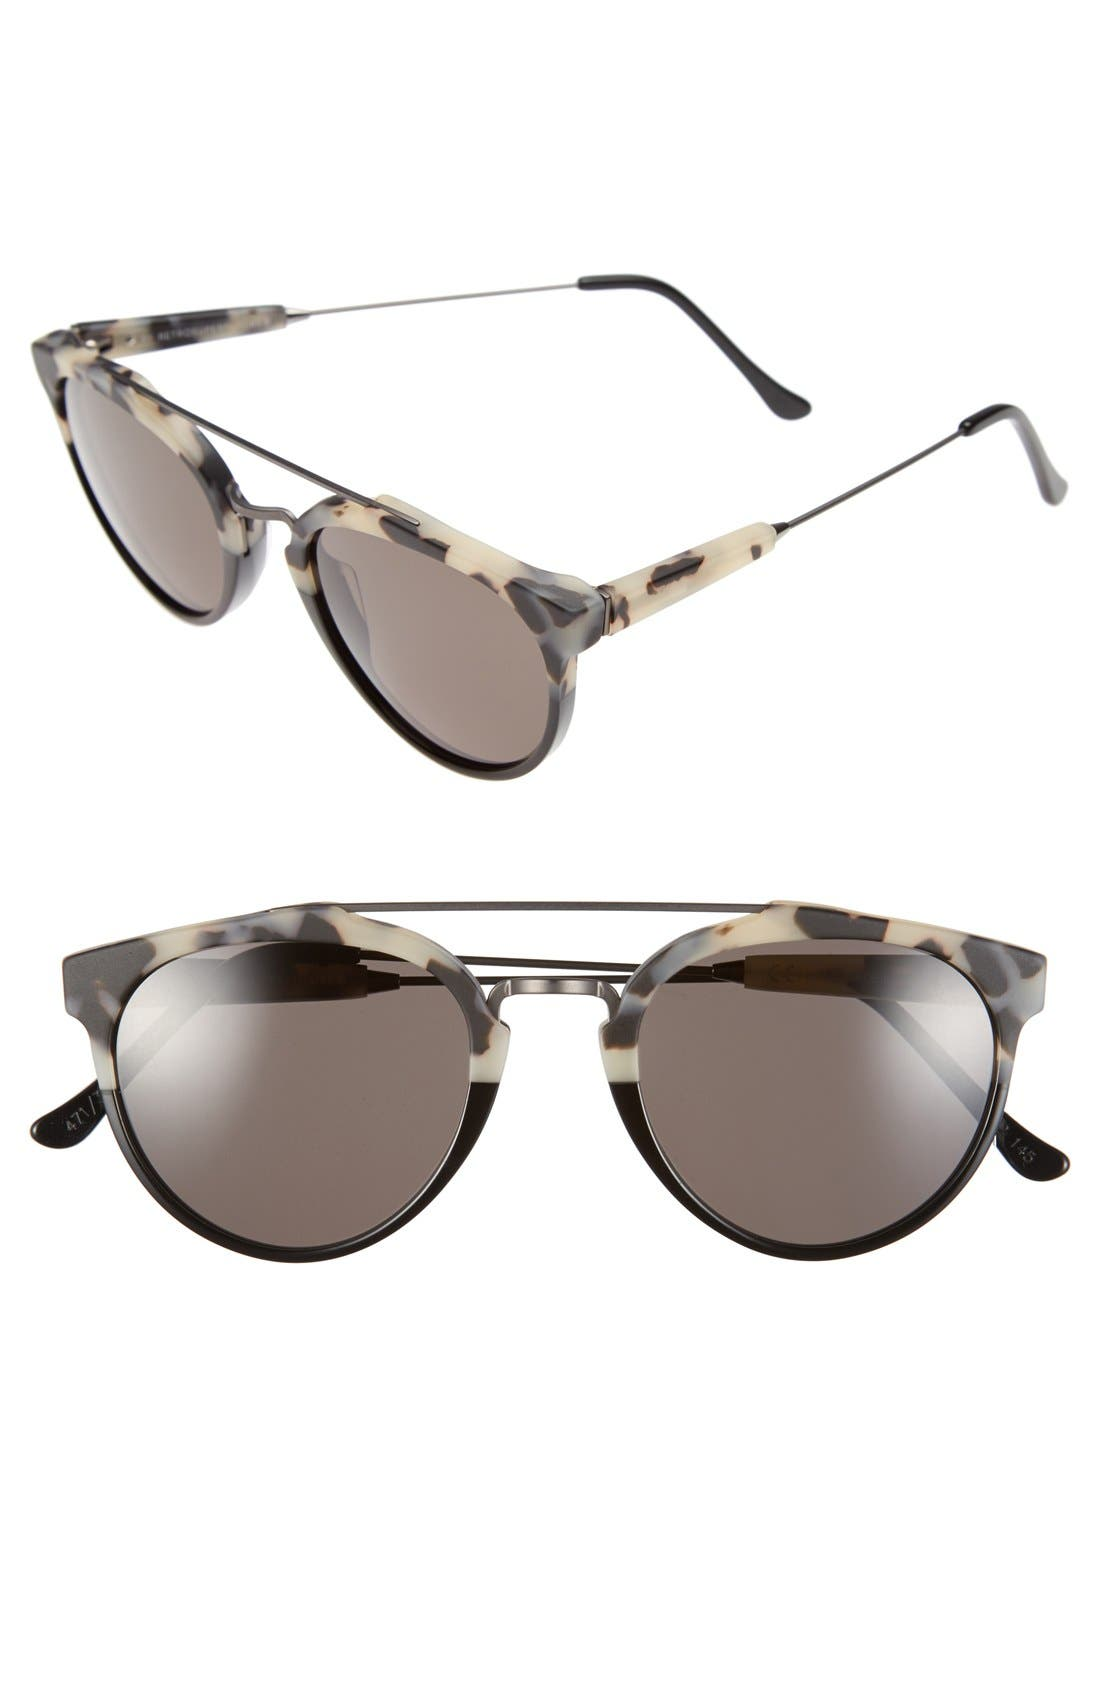 Alternate Image 1 Selected - SUPER by RETROSUPERFUTURE® 'Giaguaro' 50mm Sunglasses